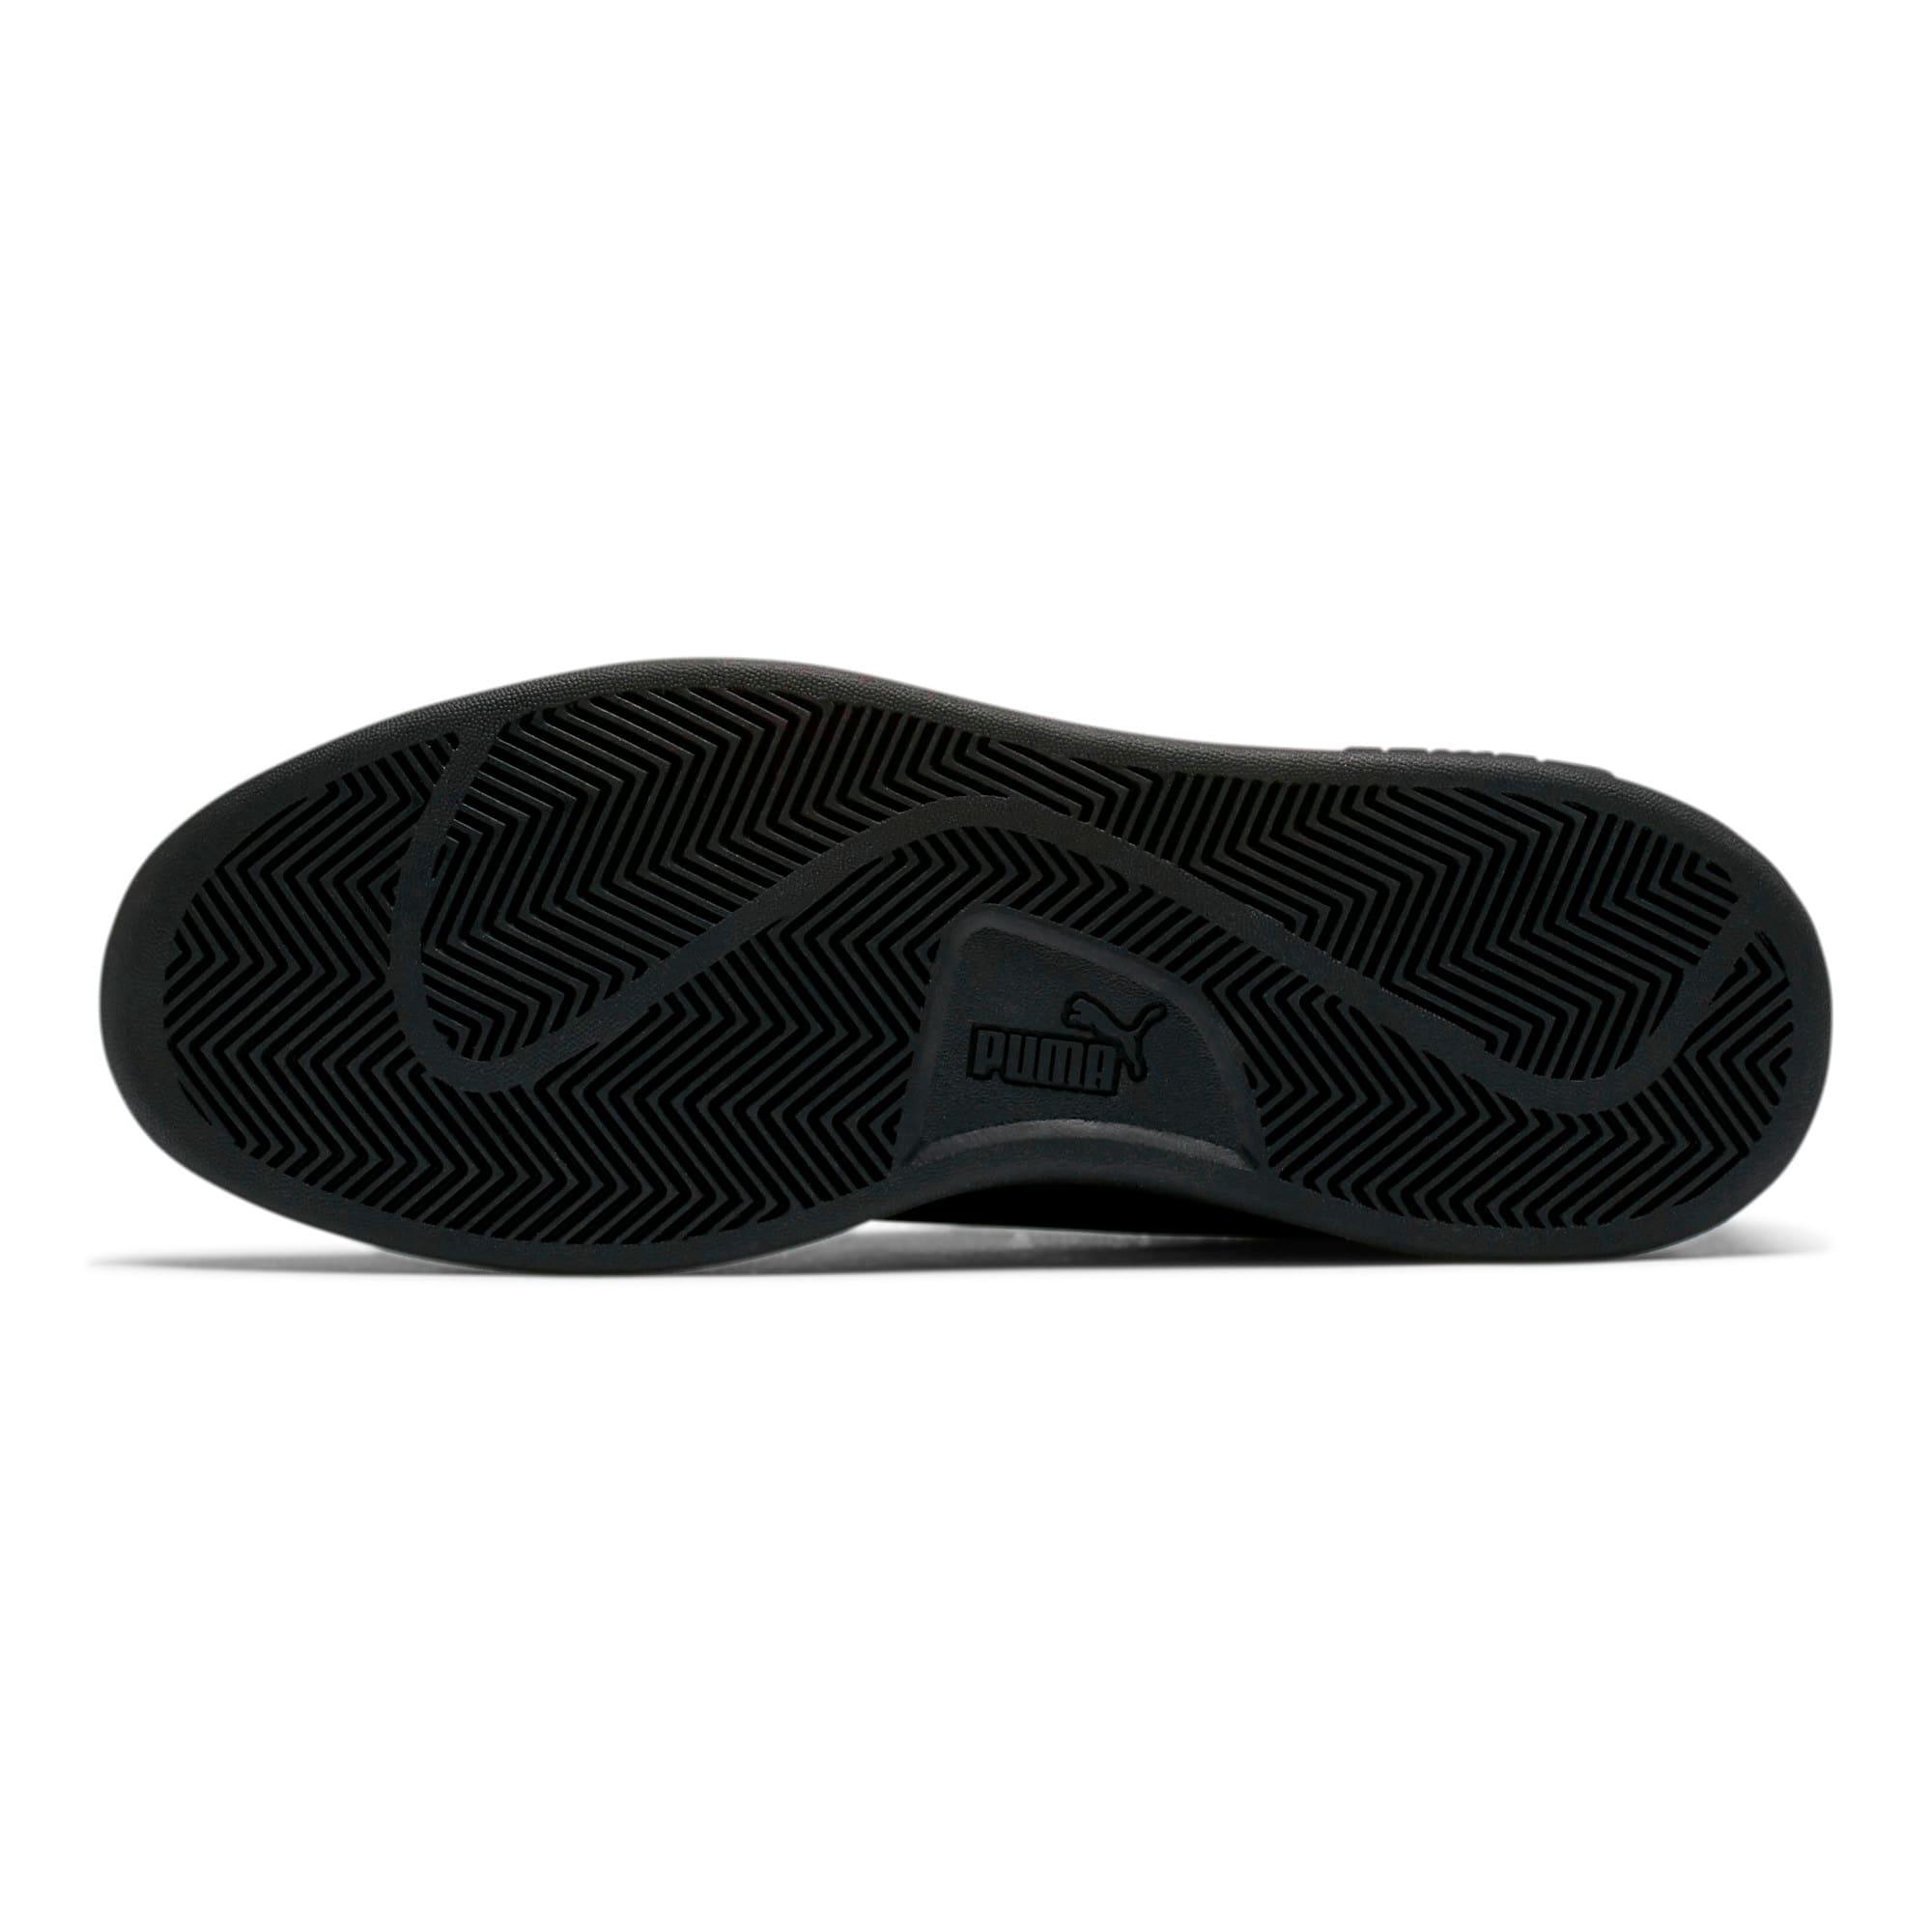 Thumbnail 4 of PUMA Smash v2 Leather Perf Sneakers, Puma Black-Puma Black, medium